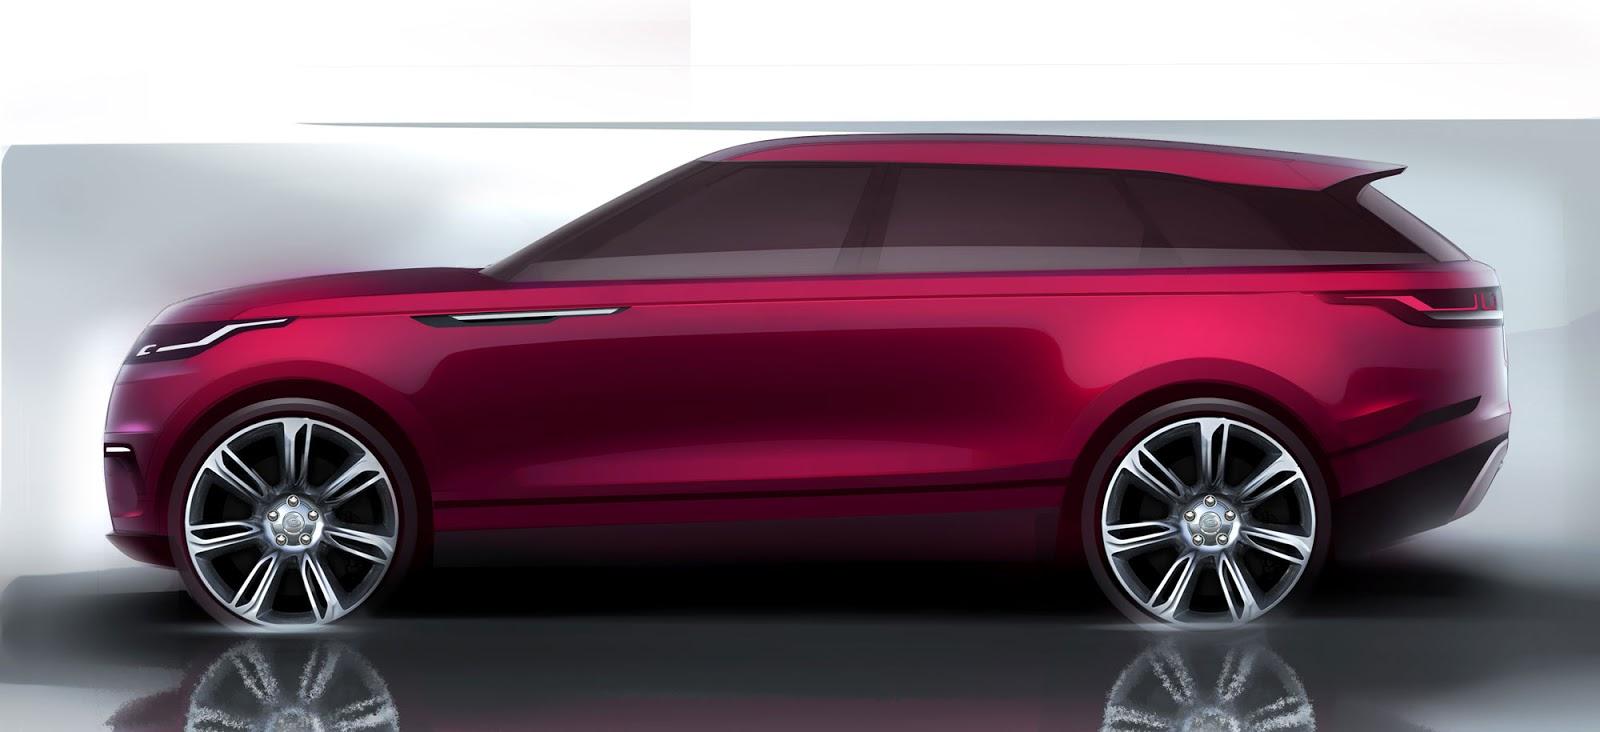 Range Rover Velar sketch side view in fuscia